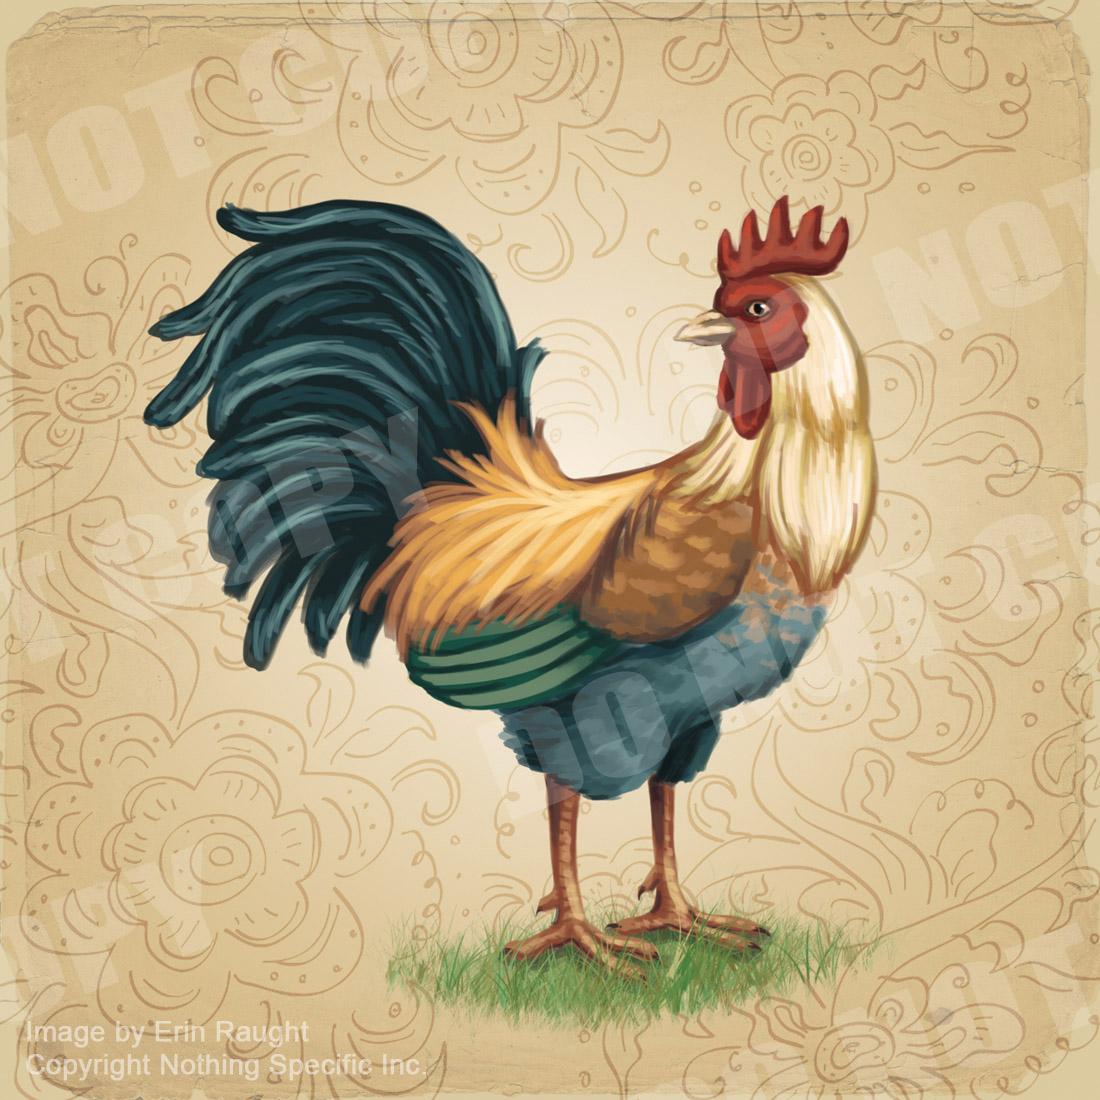 7414 - Vintage Rooster on Floral Background - Chicken Farm Animal Bird.jpg